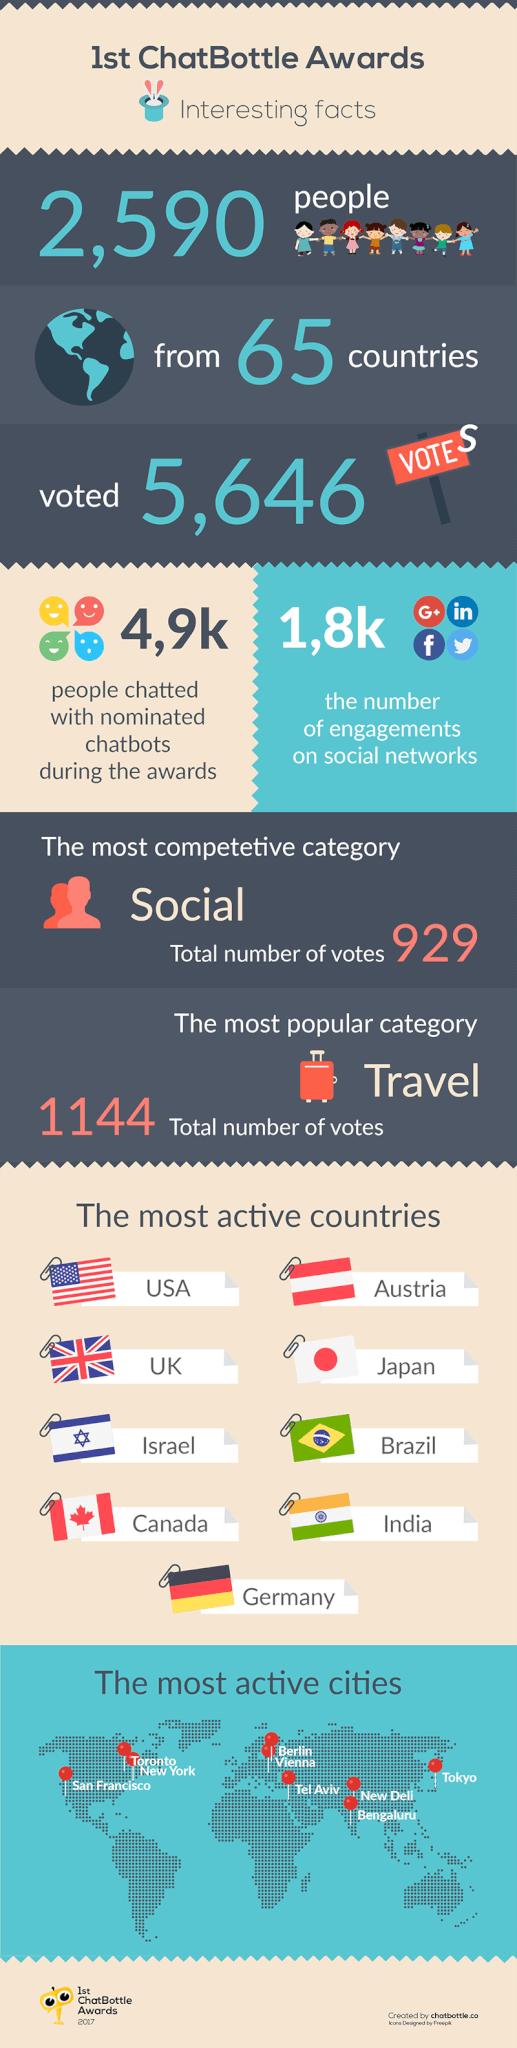 1st-chatbottle-awards-results-best-bots-interesting-facts